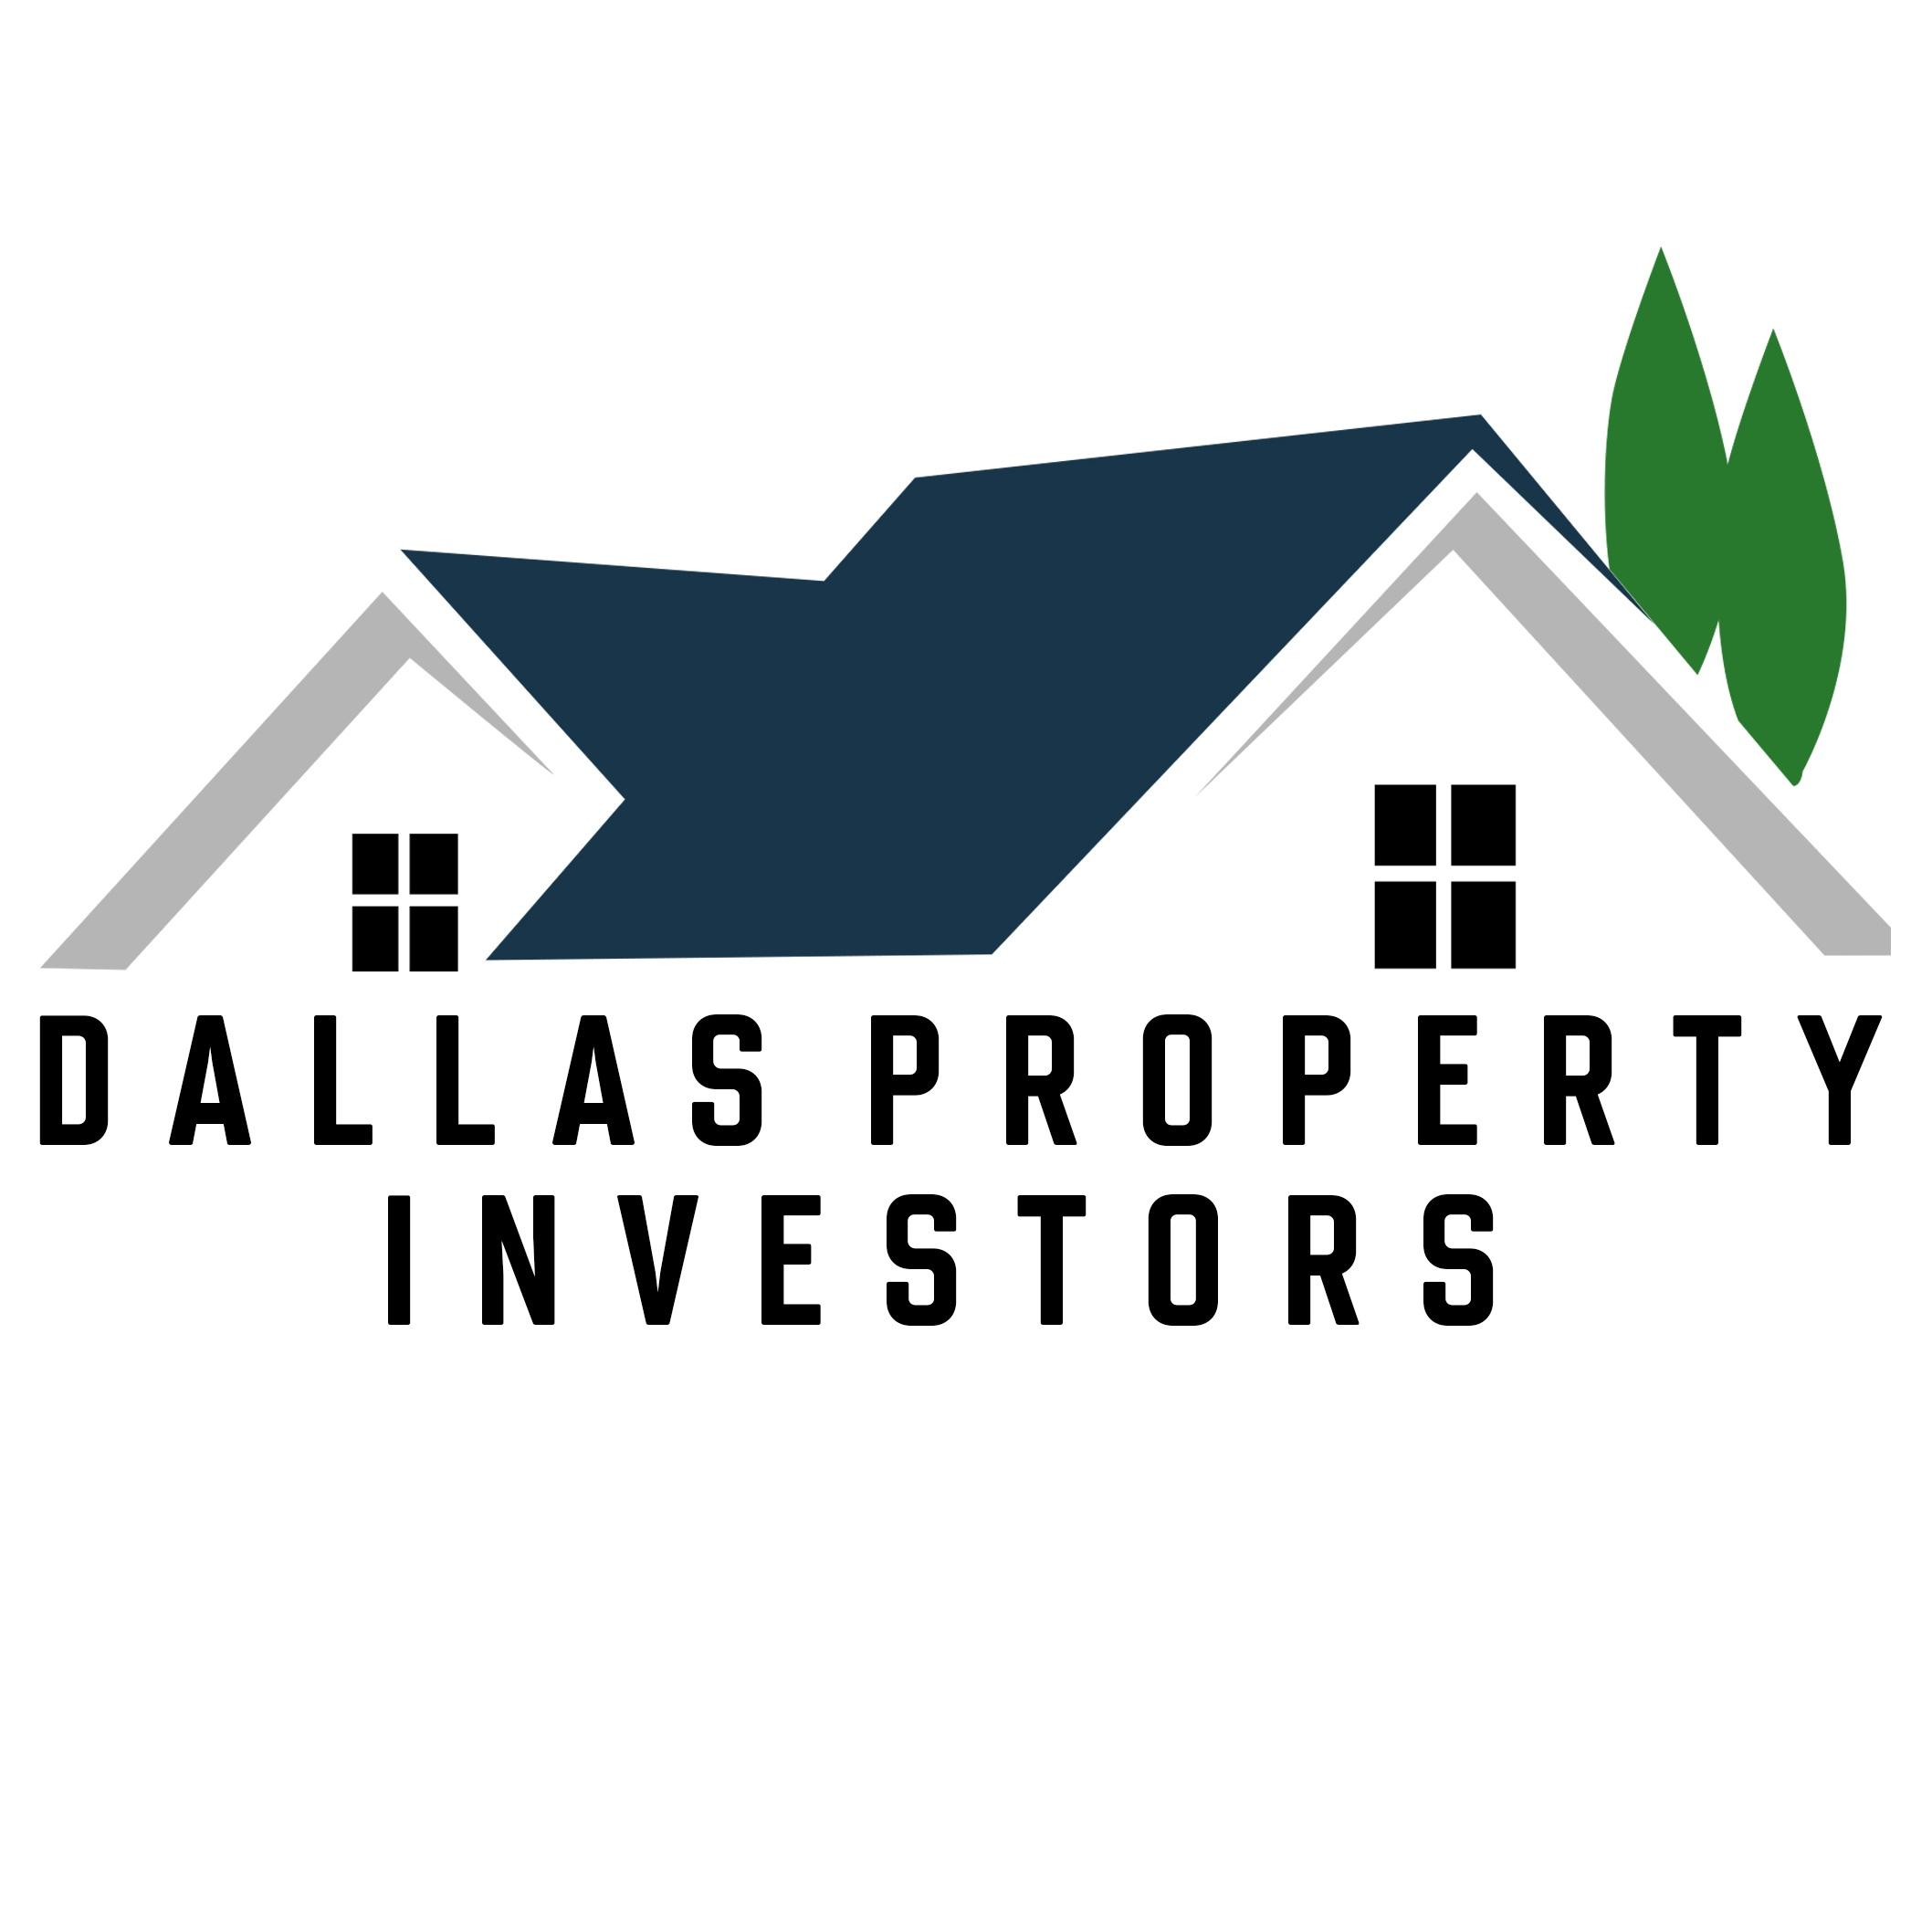 Dallas Property Investors